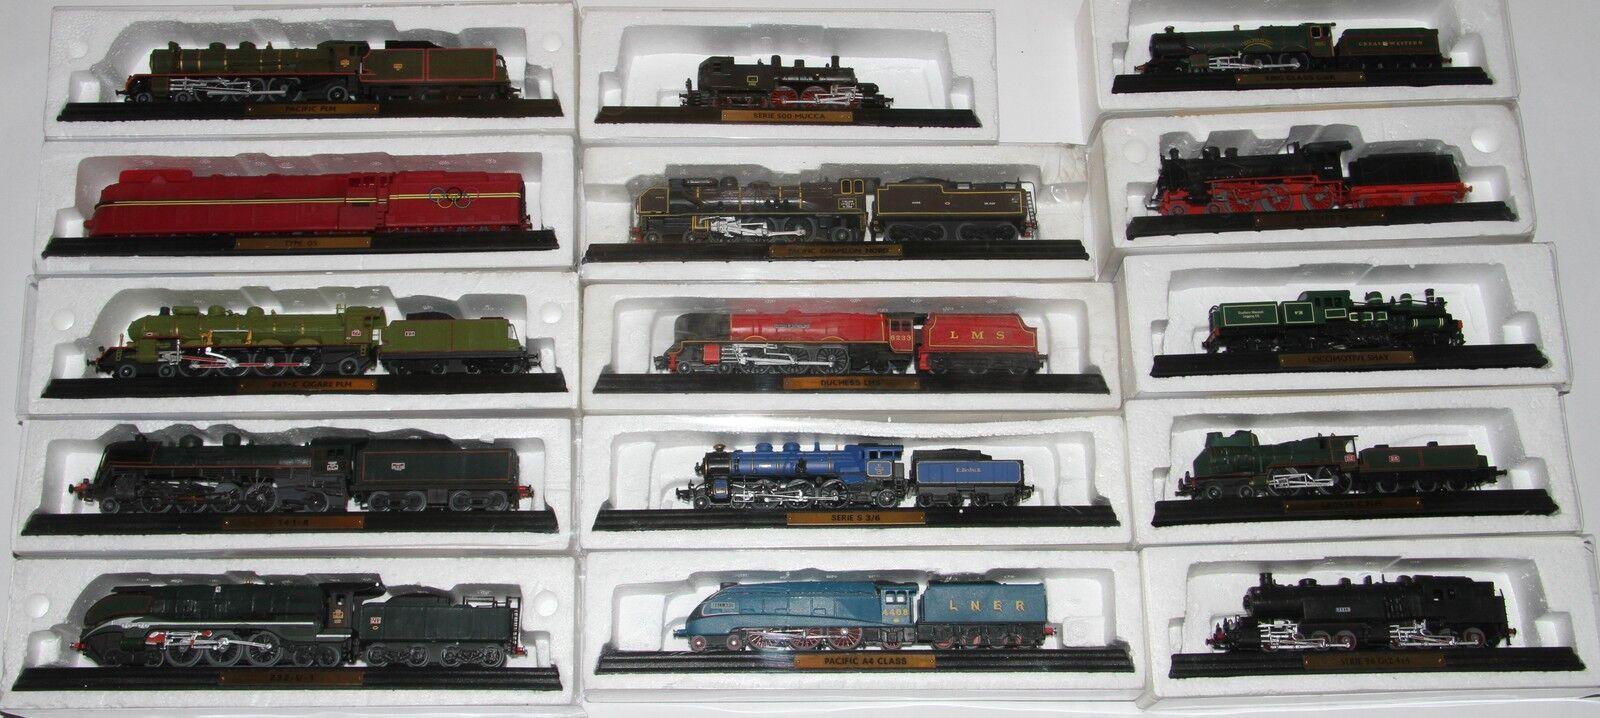 Locomotora de Vapor  Locomotora Locomotora Train Standmodell Atlas Maßstab